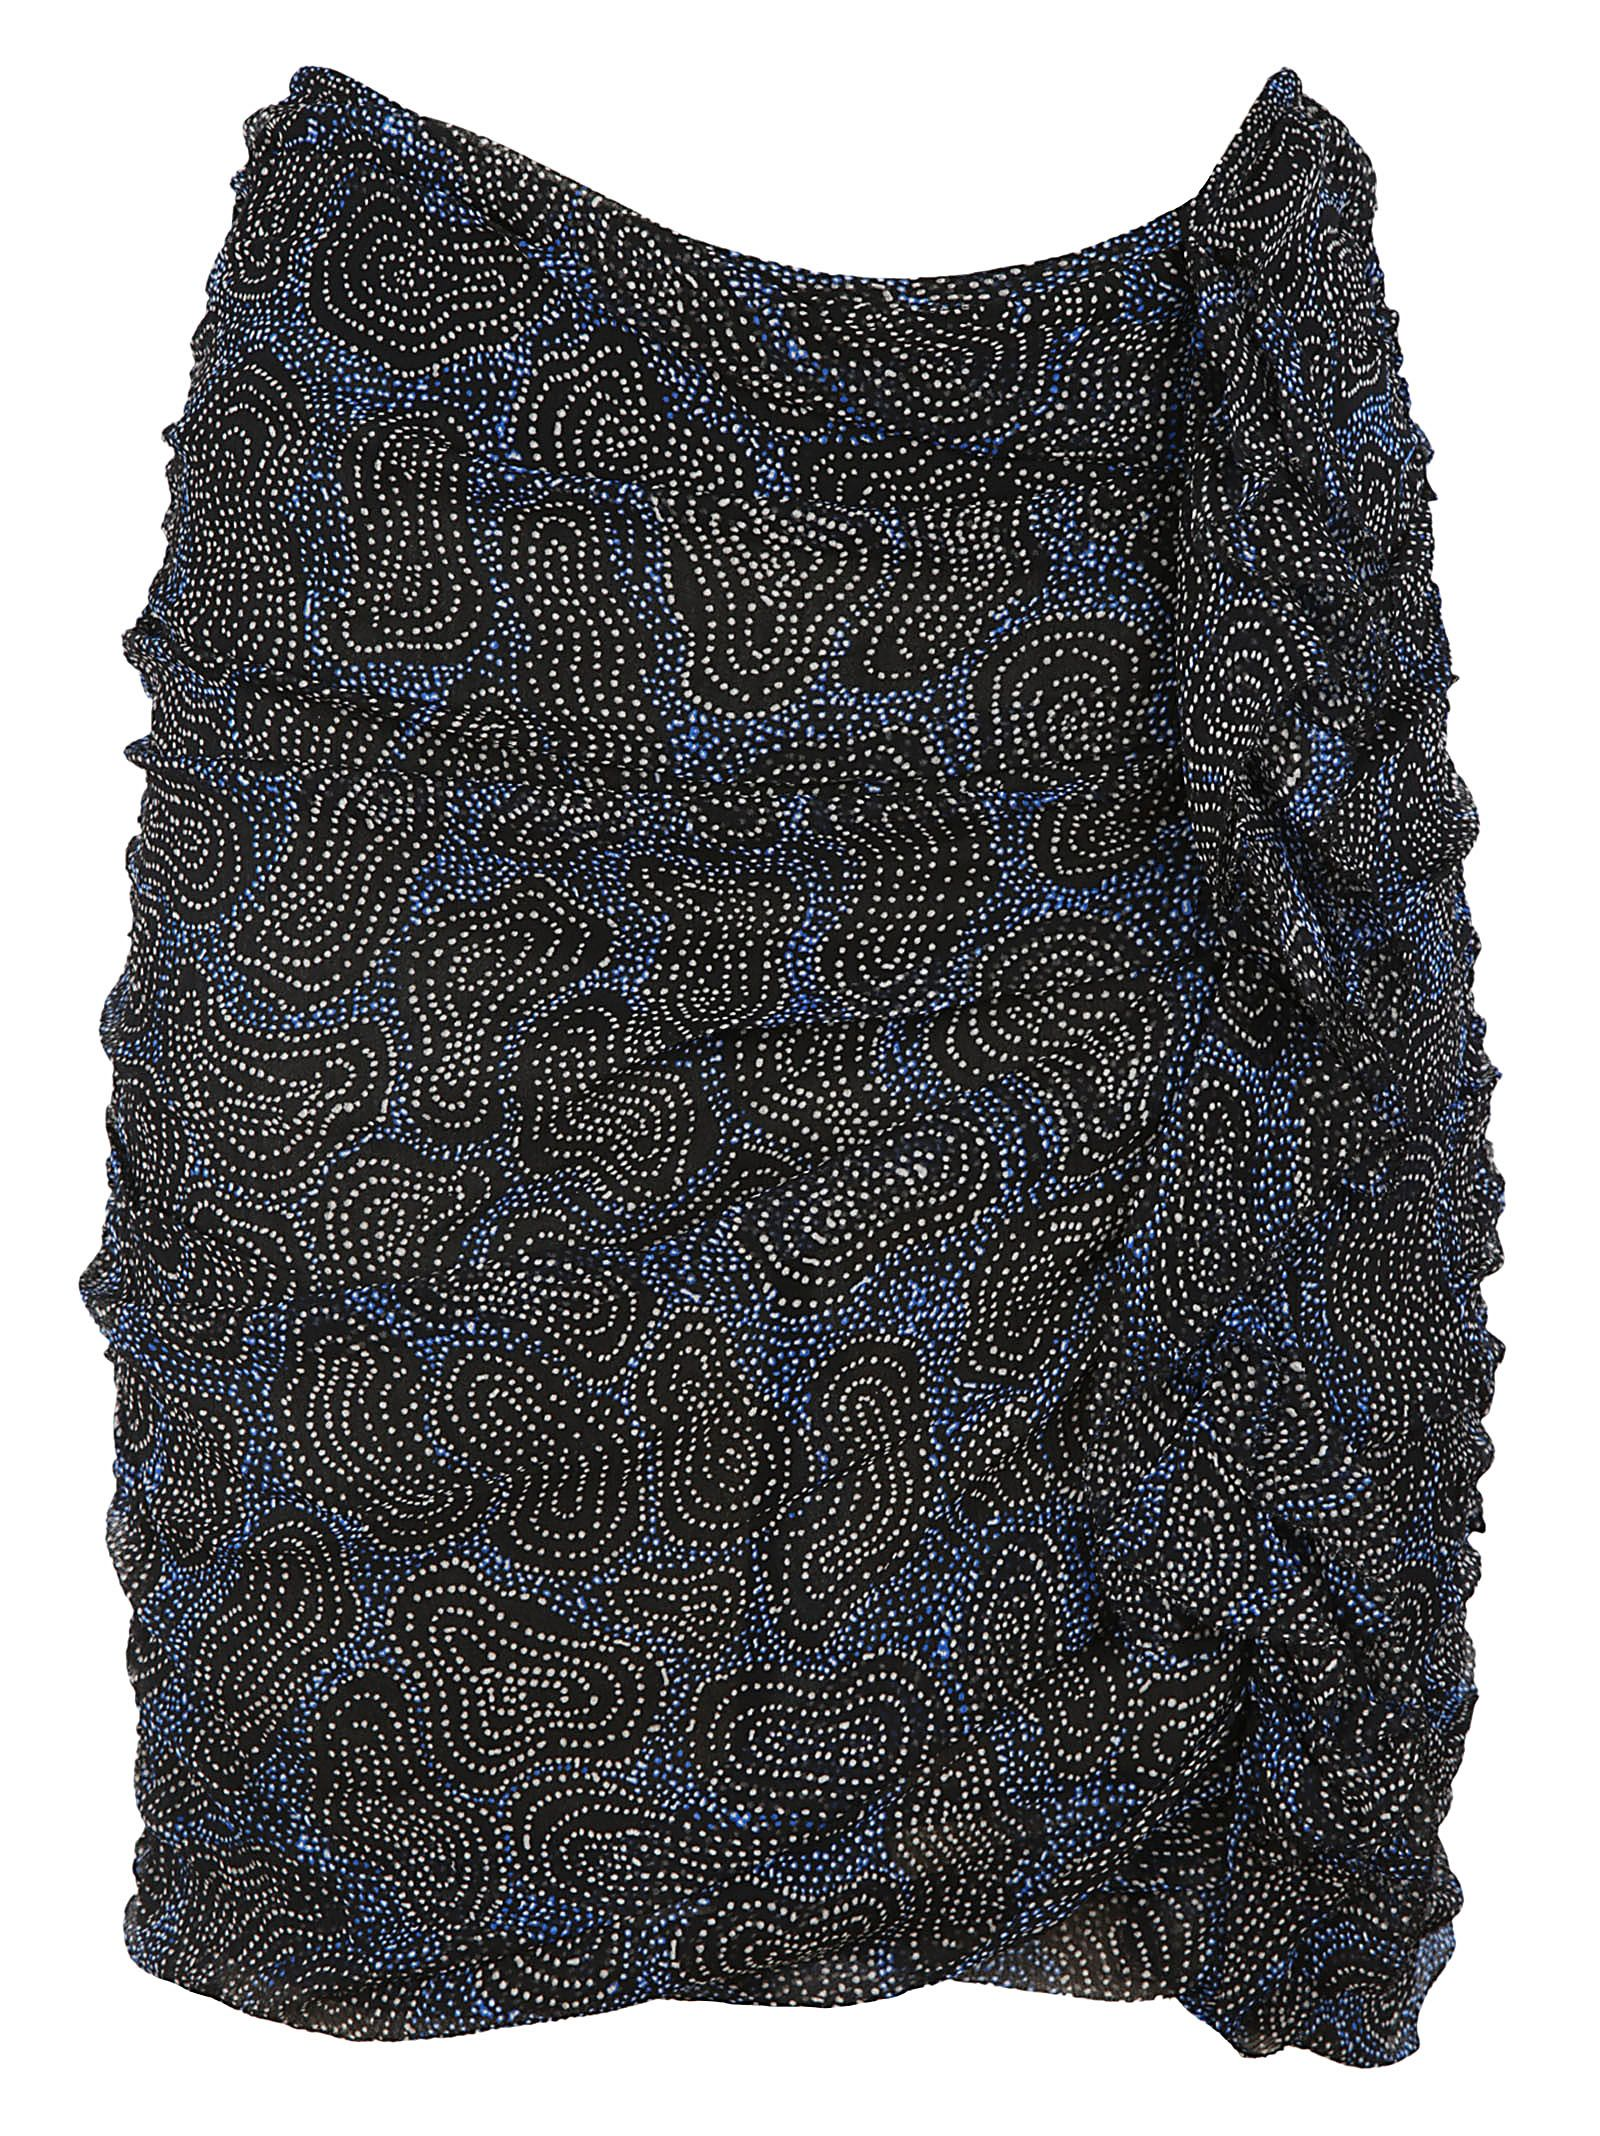 Isabel Marant Edna Printed Chiffon Skirt